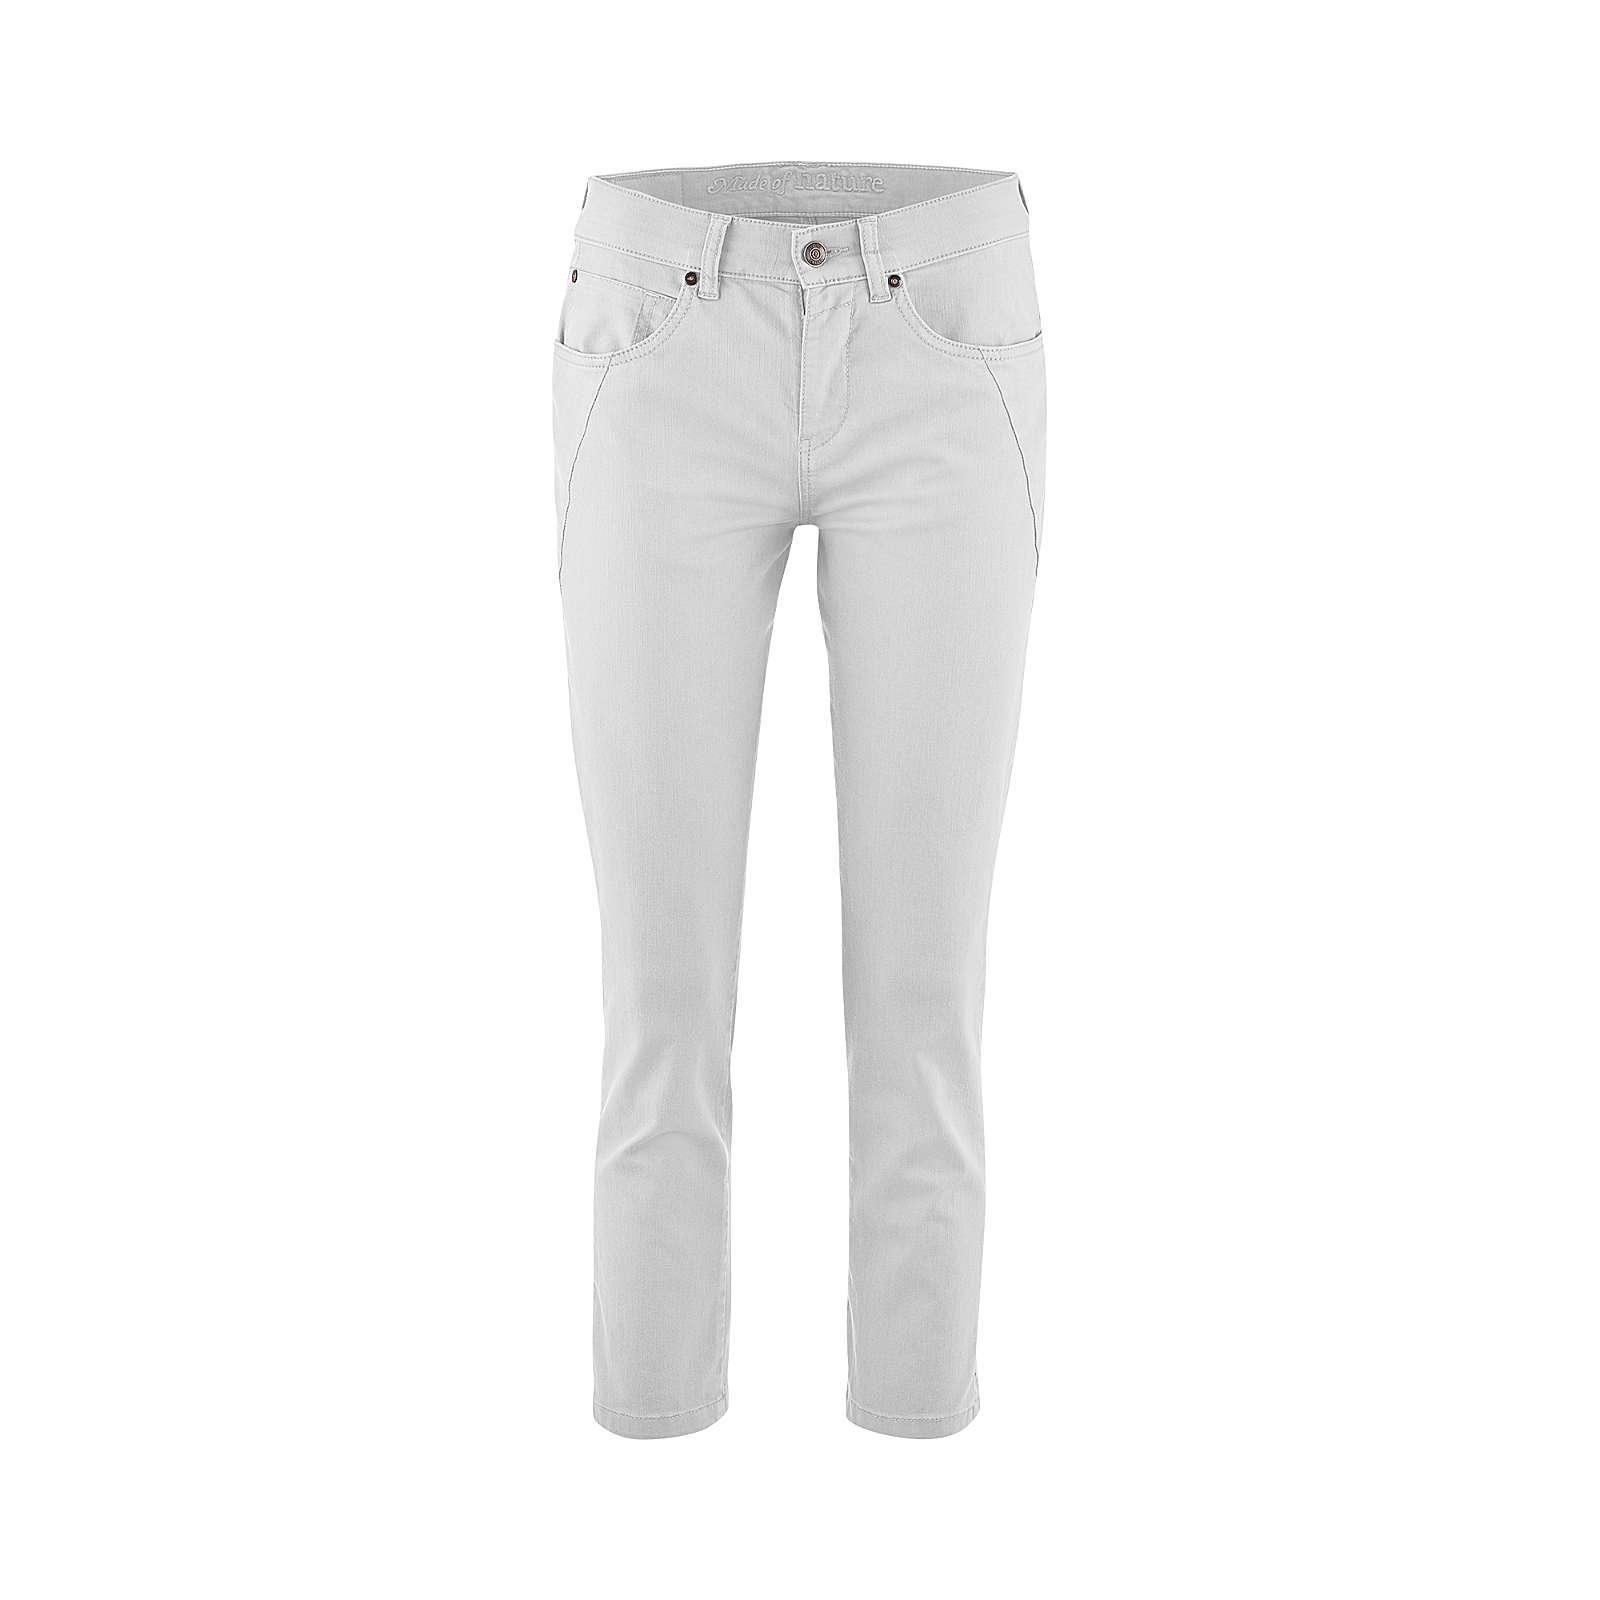 LIVING CRAFTS 5-Pocket-Hose Stoffhosen offwhite Damen Gr. 31